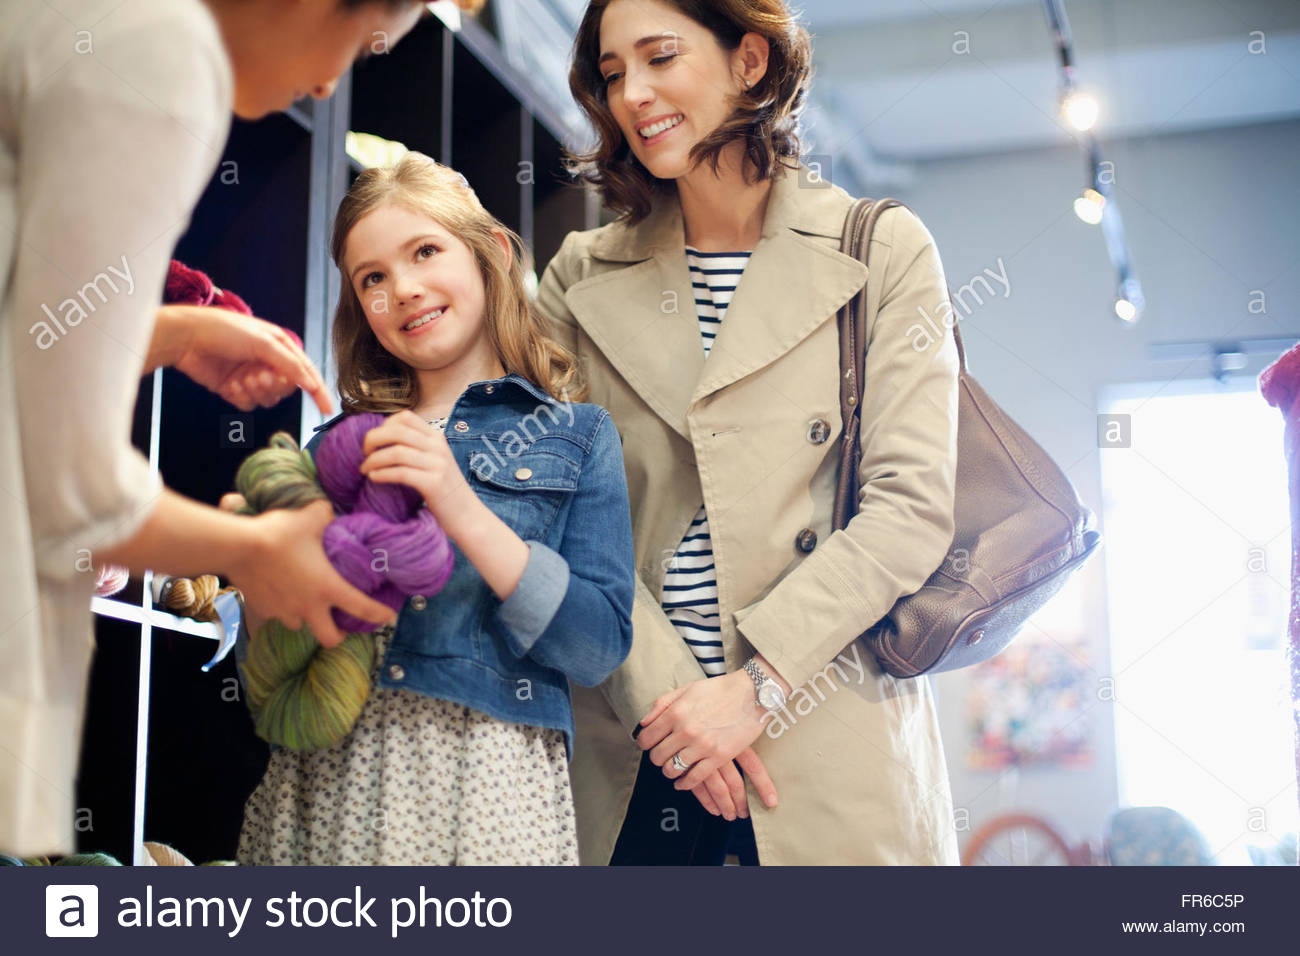 shop owner advising on yarn choice - Stock Image